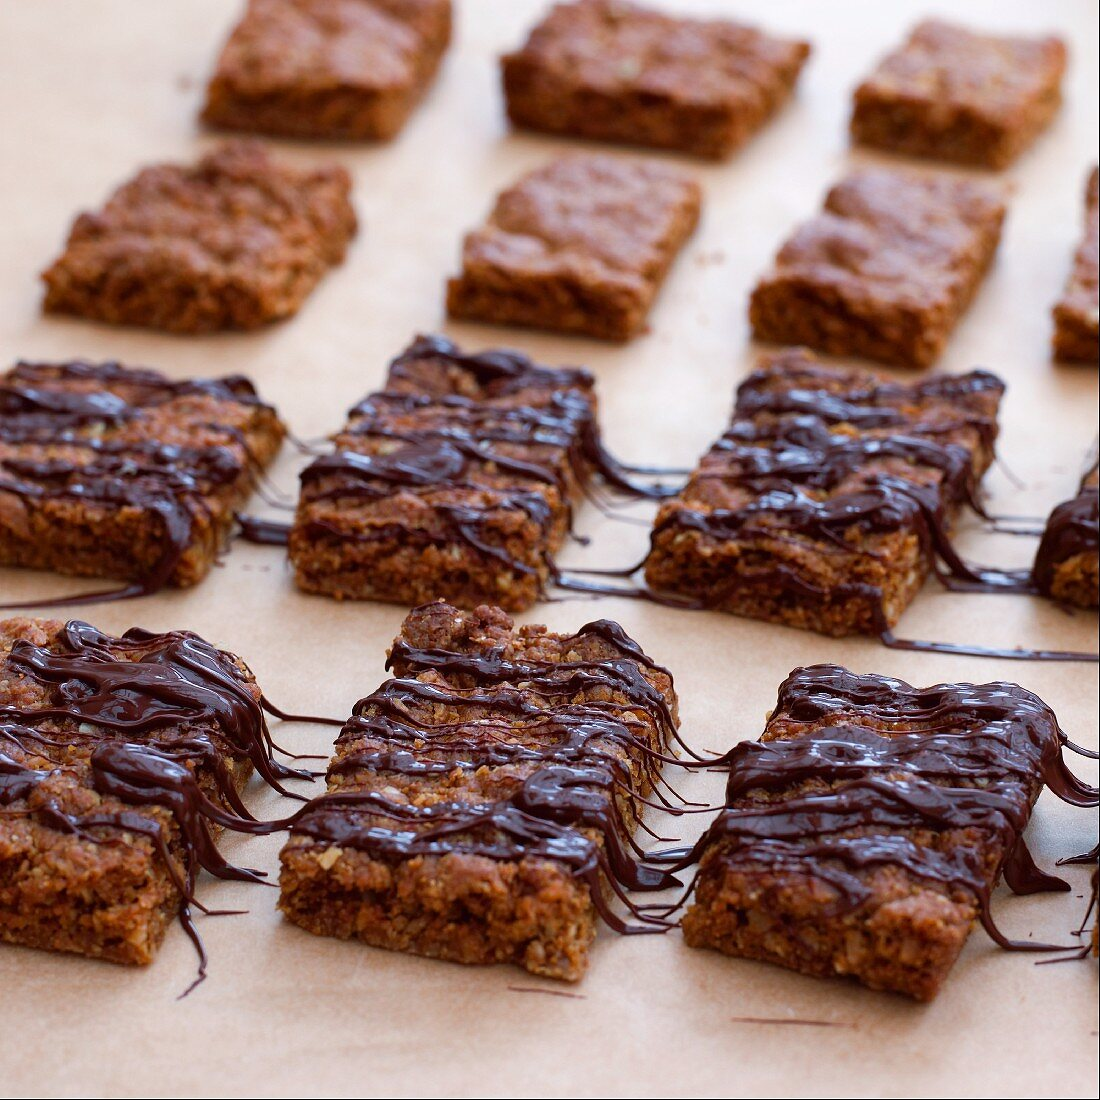 Chocolate Flapjacks (Sweet oat slices, UK)